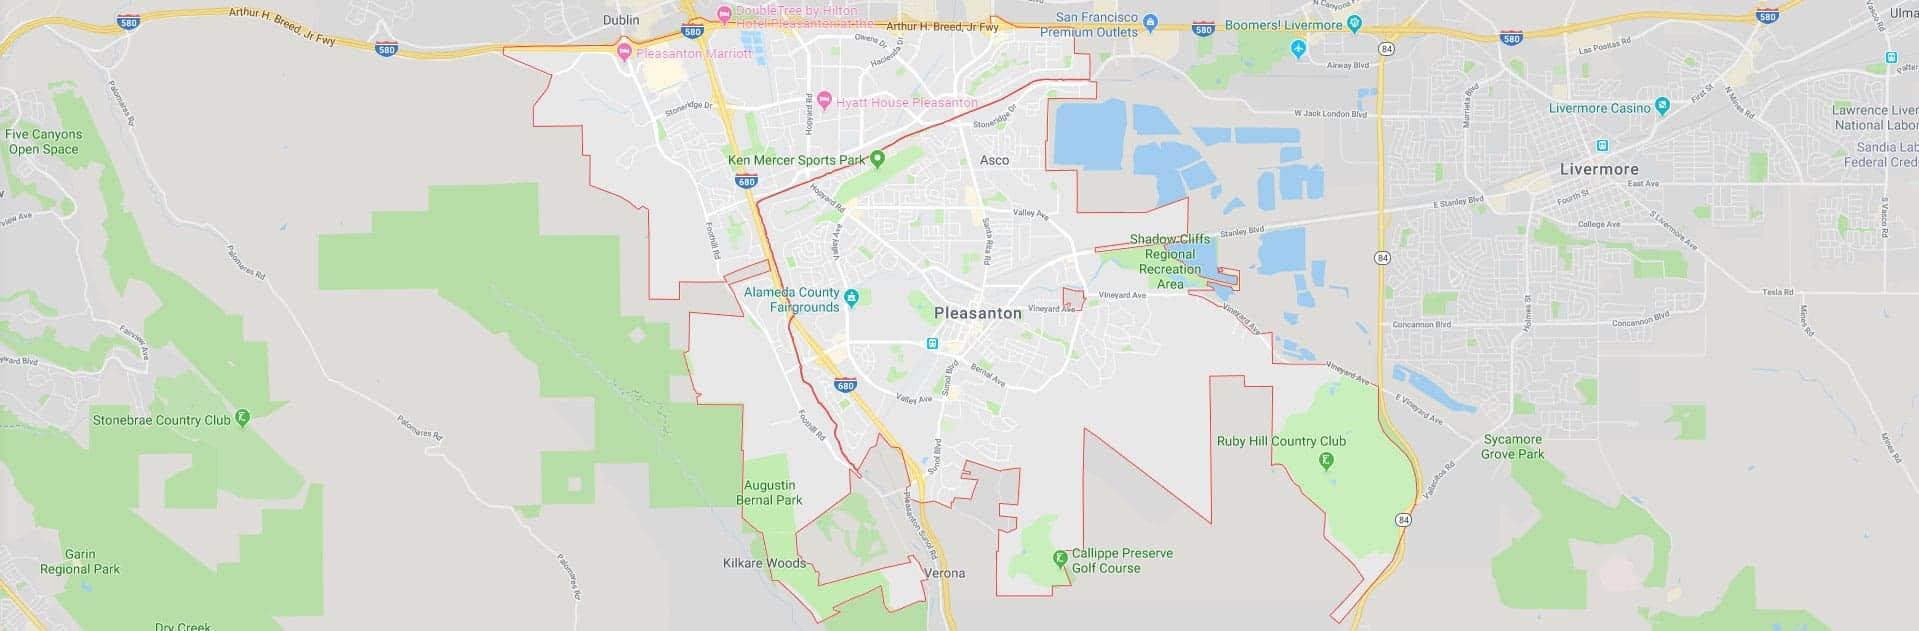 pleasanton-ca-map